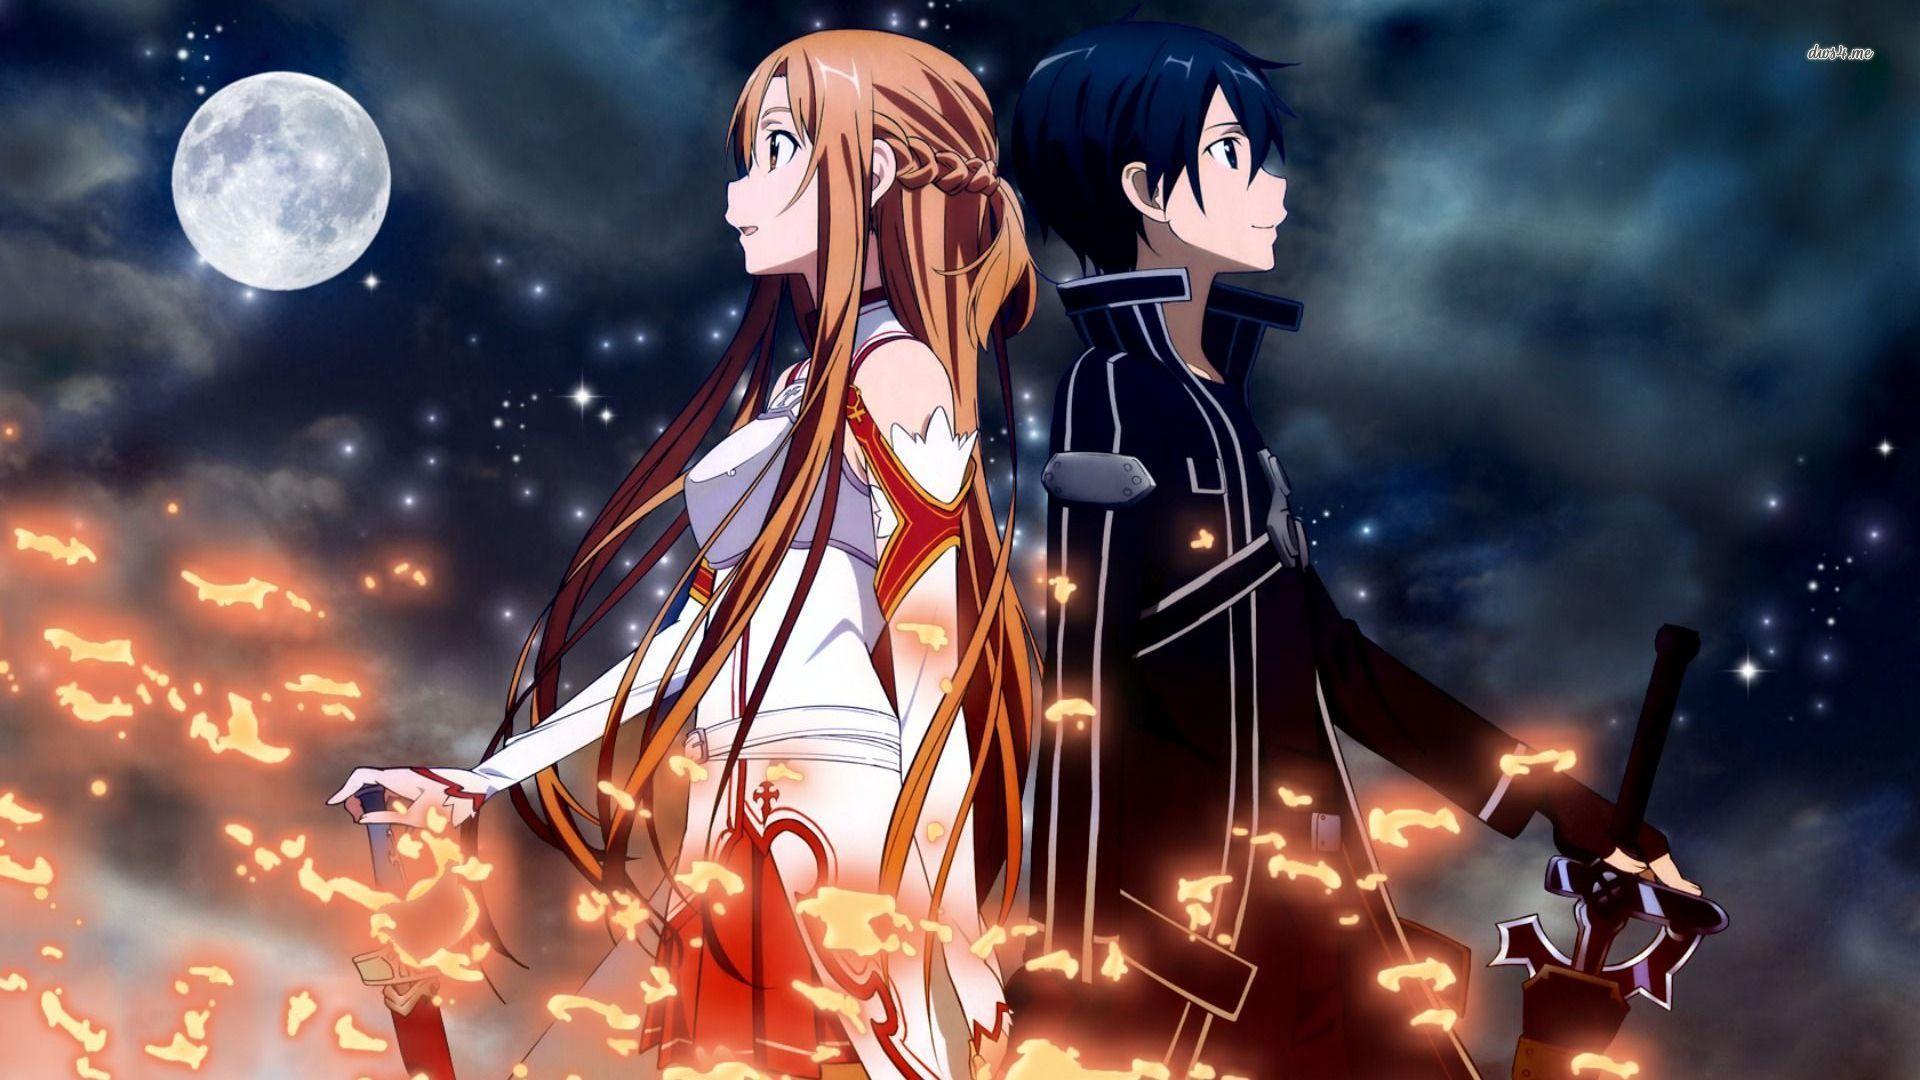 kirito and Anime asuna